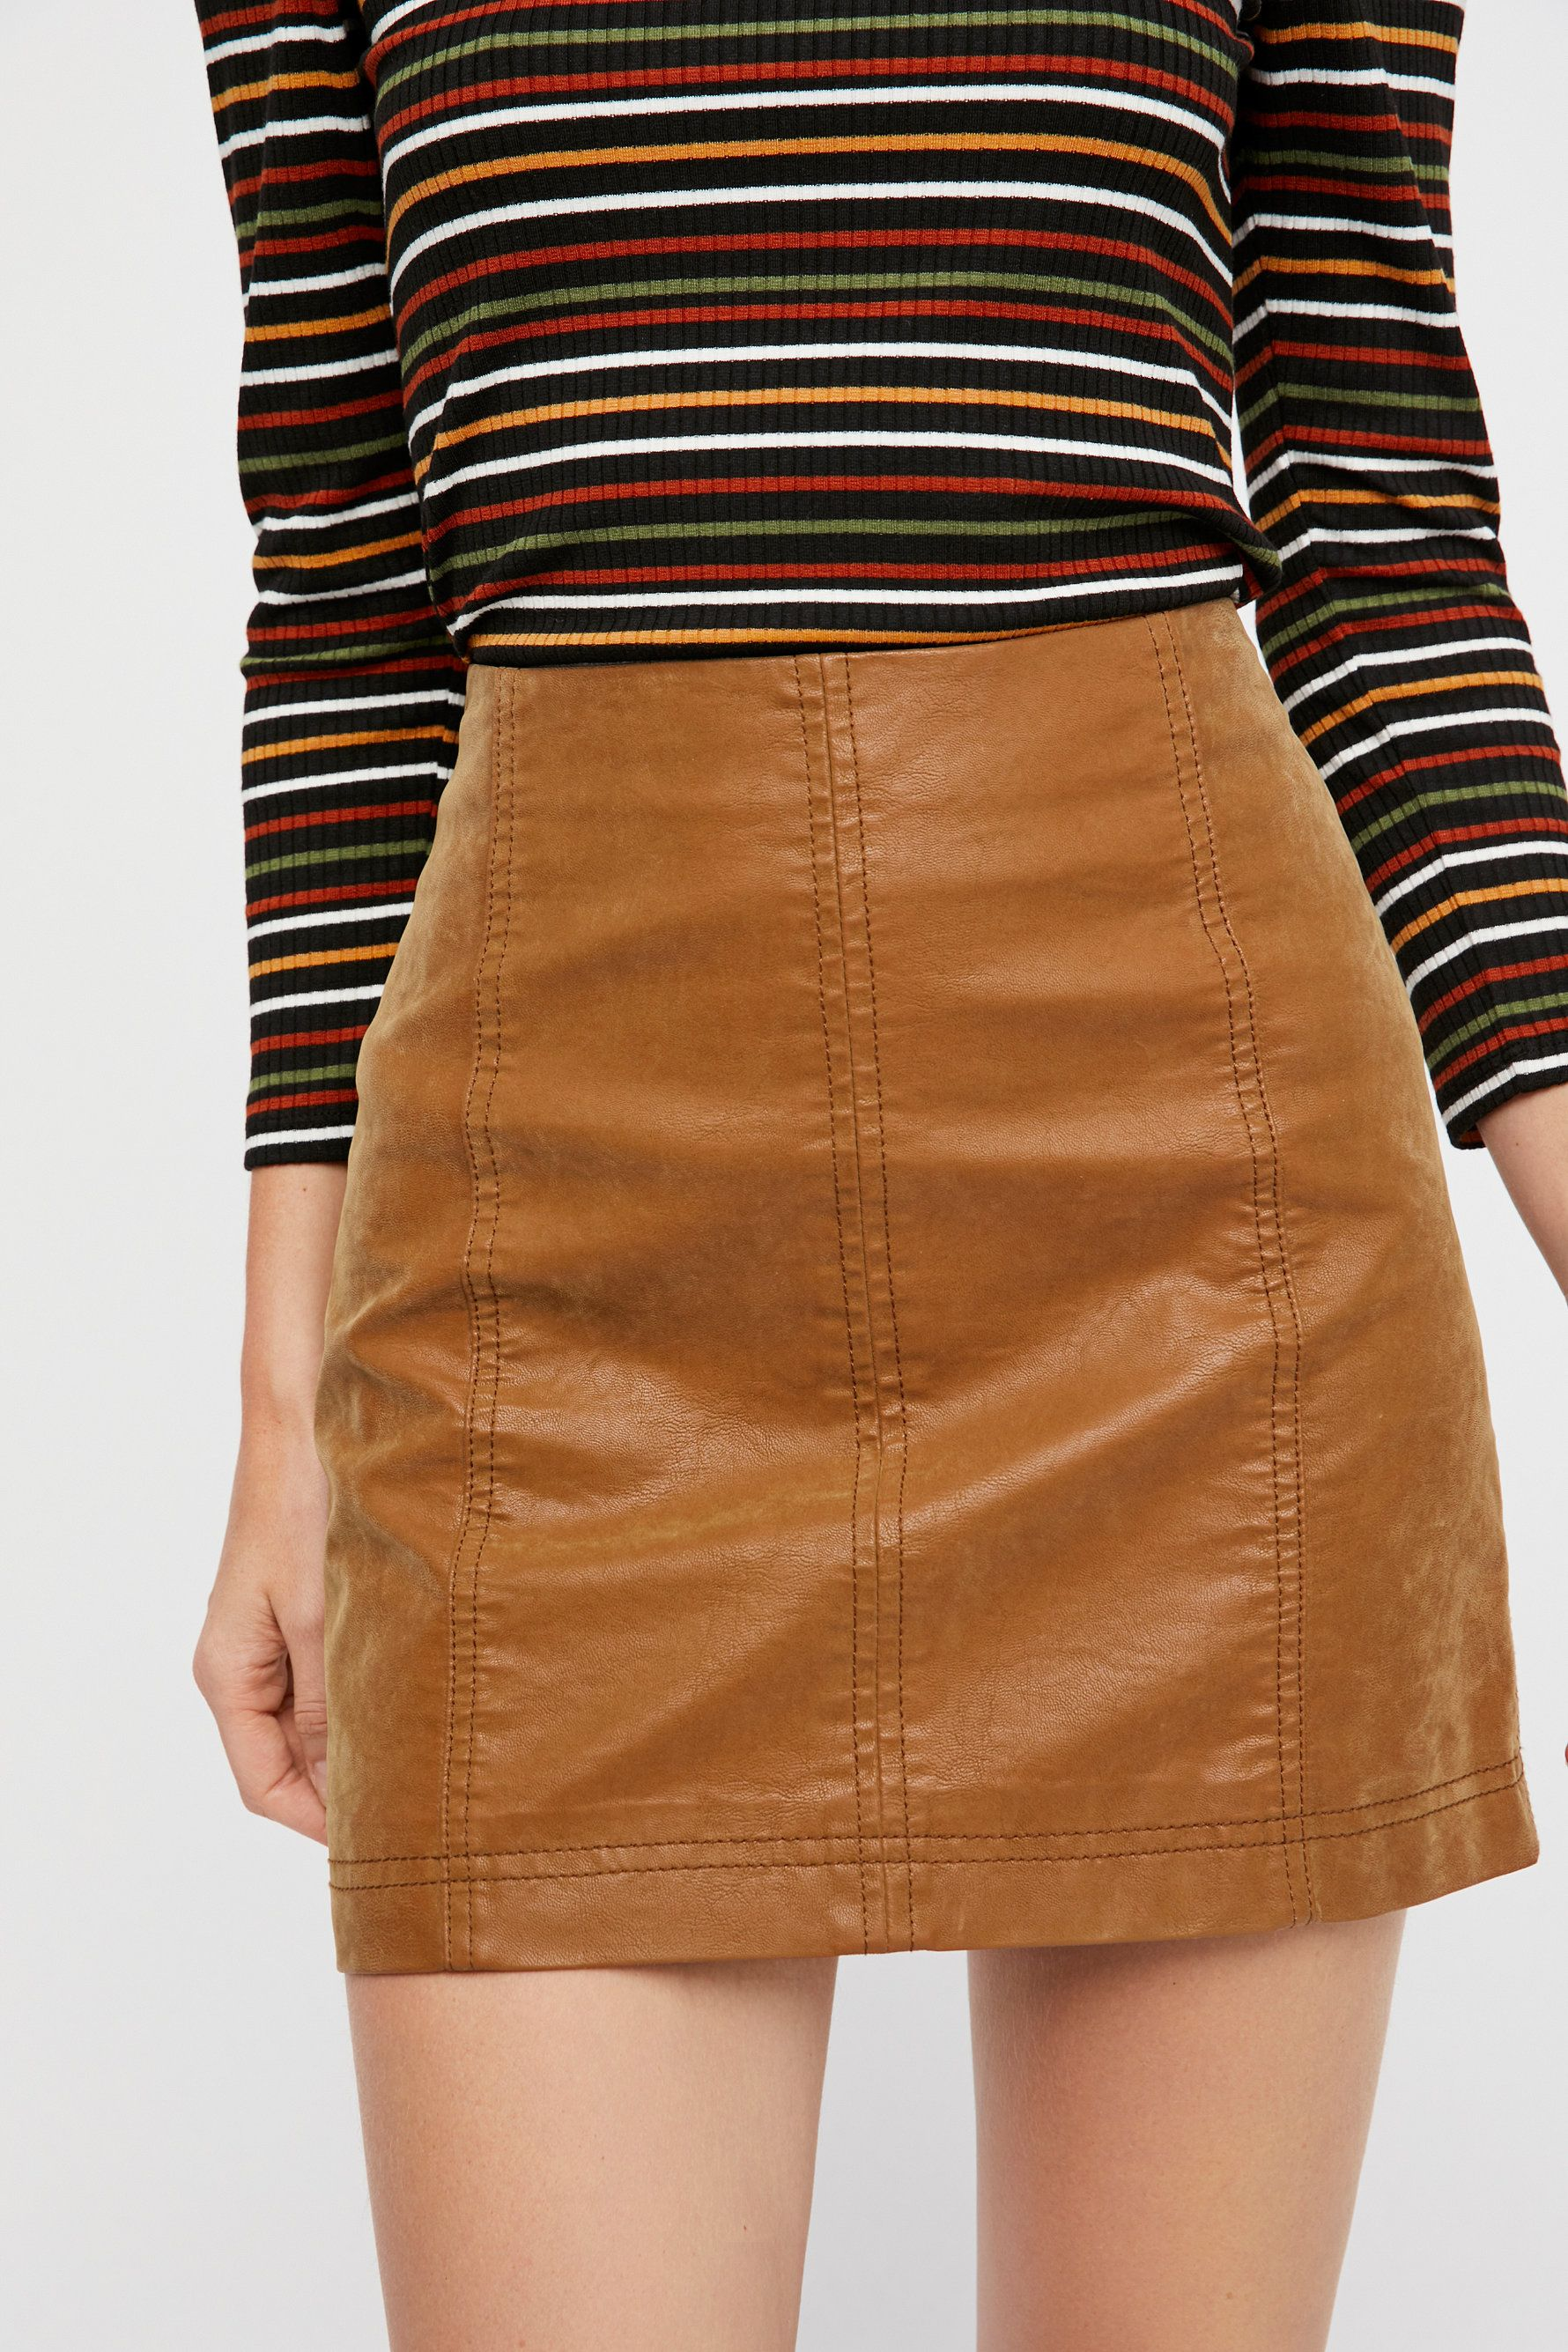 a4a79f1a7b6d05 Modern Femme Vegan Mini in chestnut Suede Mini Skirt, Leather Skirt,  Bohemian Skirt,